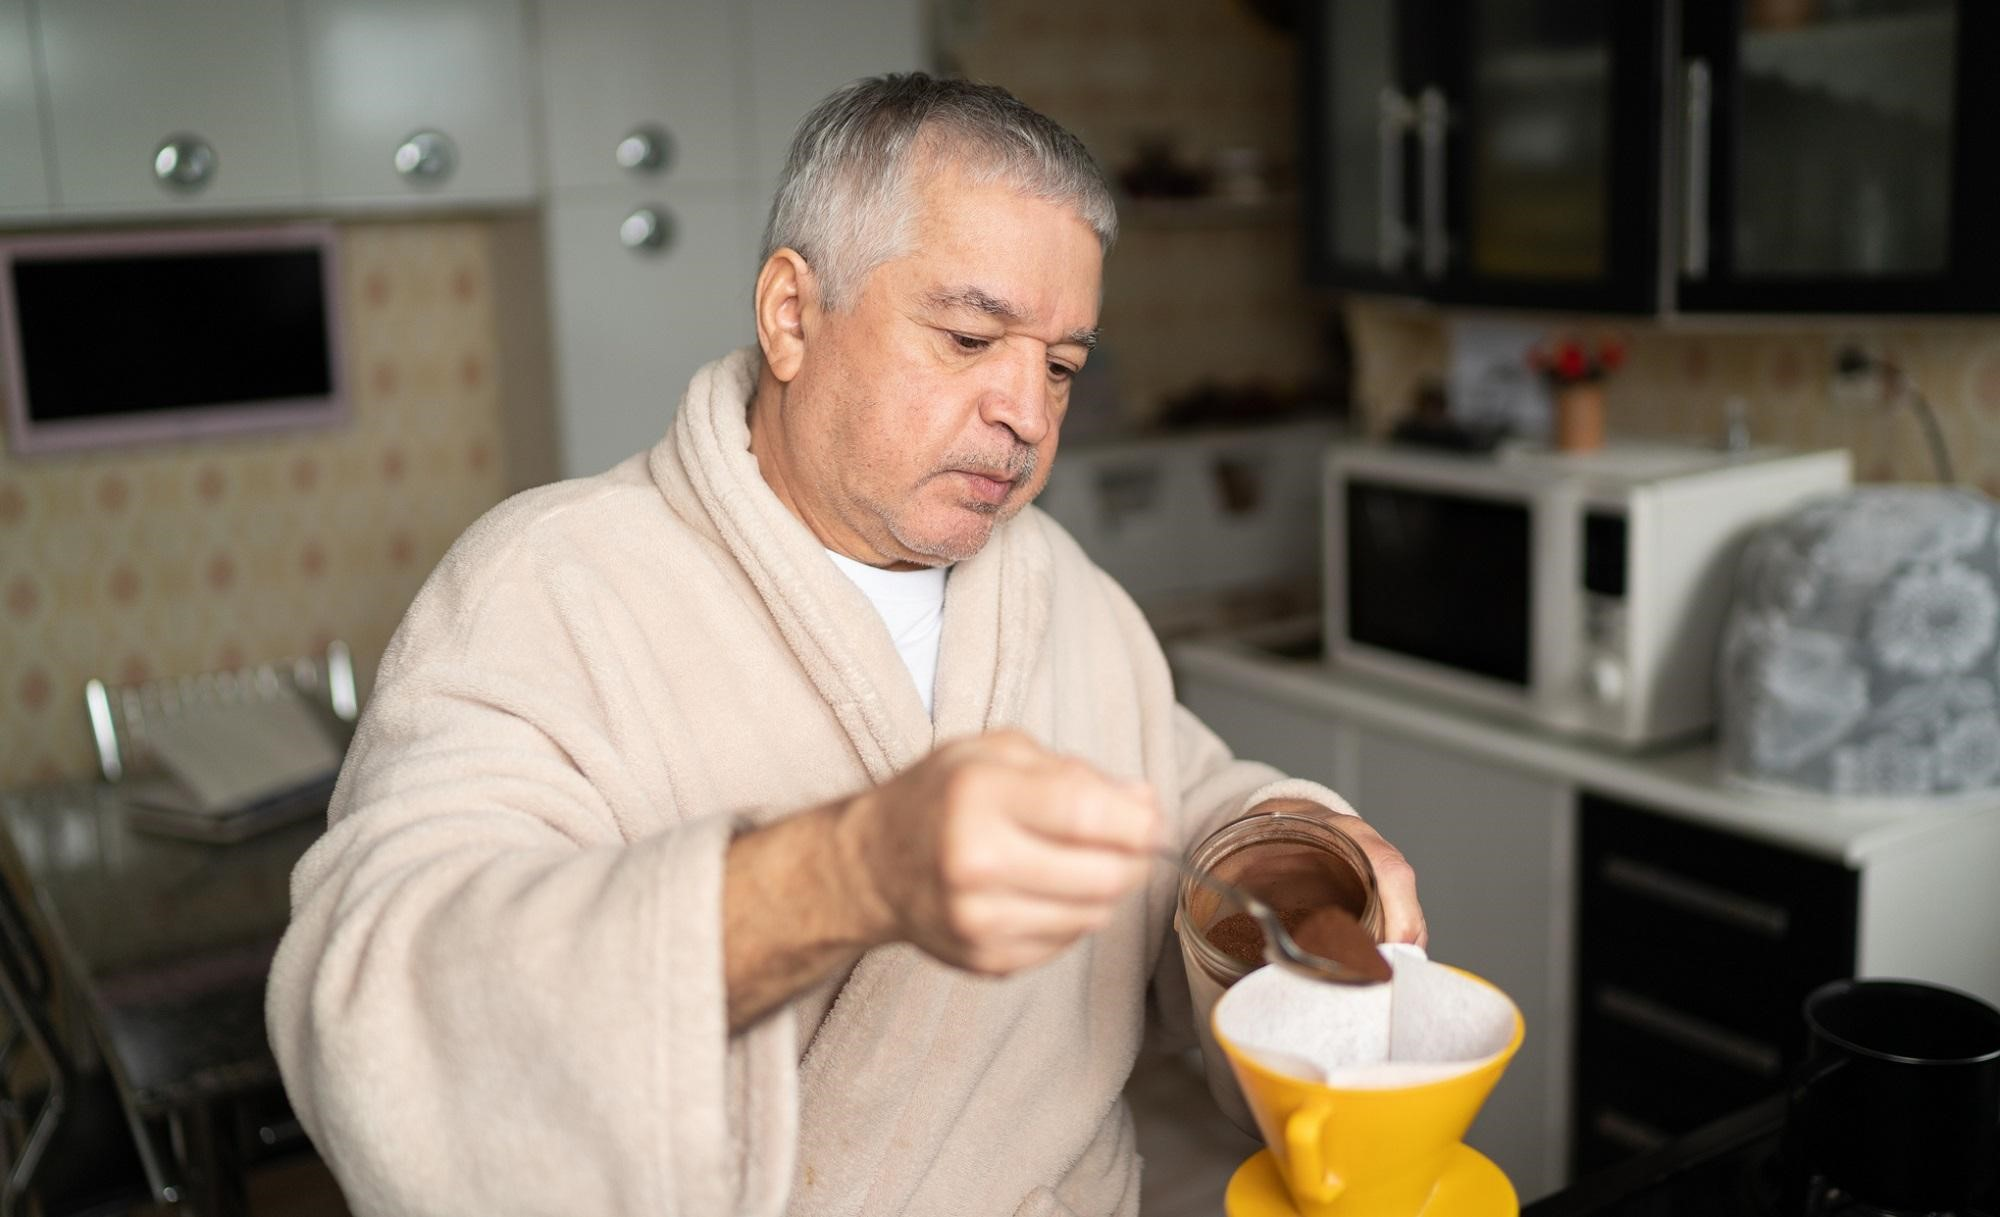 An older man in a bathrobe making coffee.